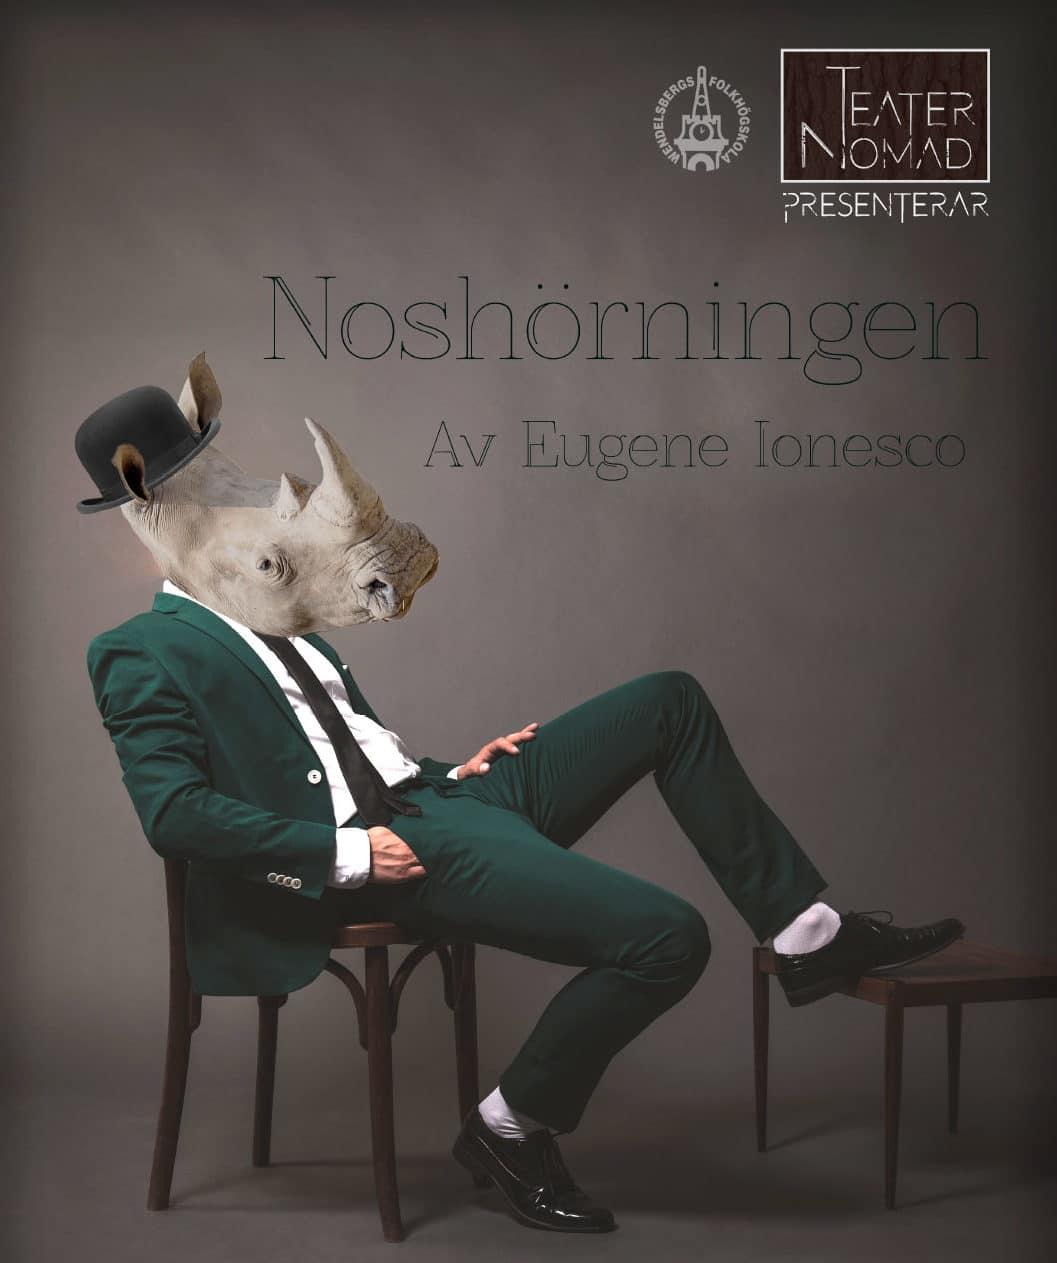 Teater Nomad: Noshörningen + Trender i landet lagom